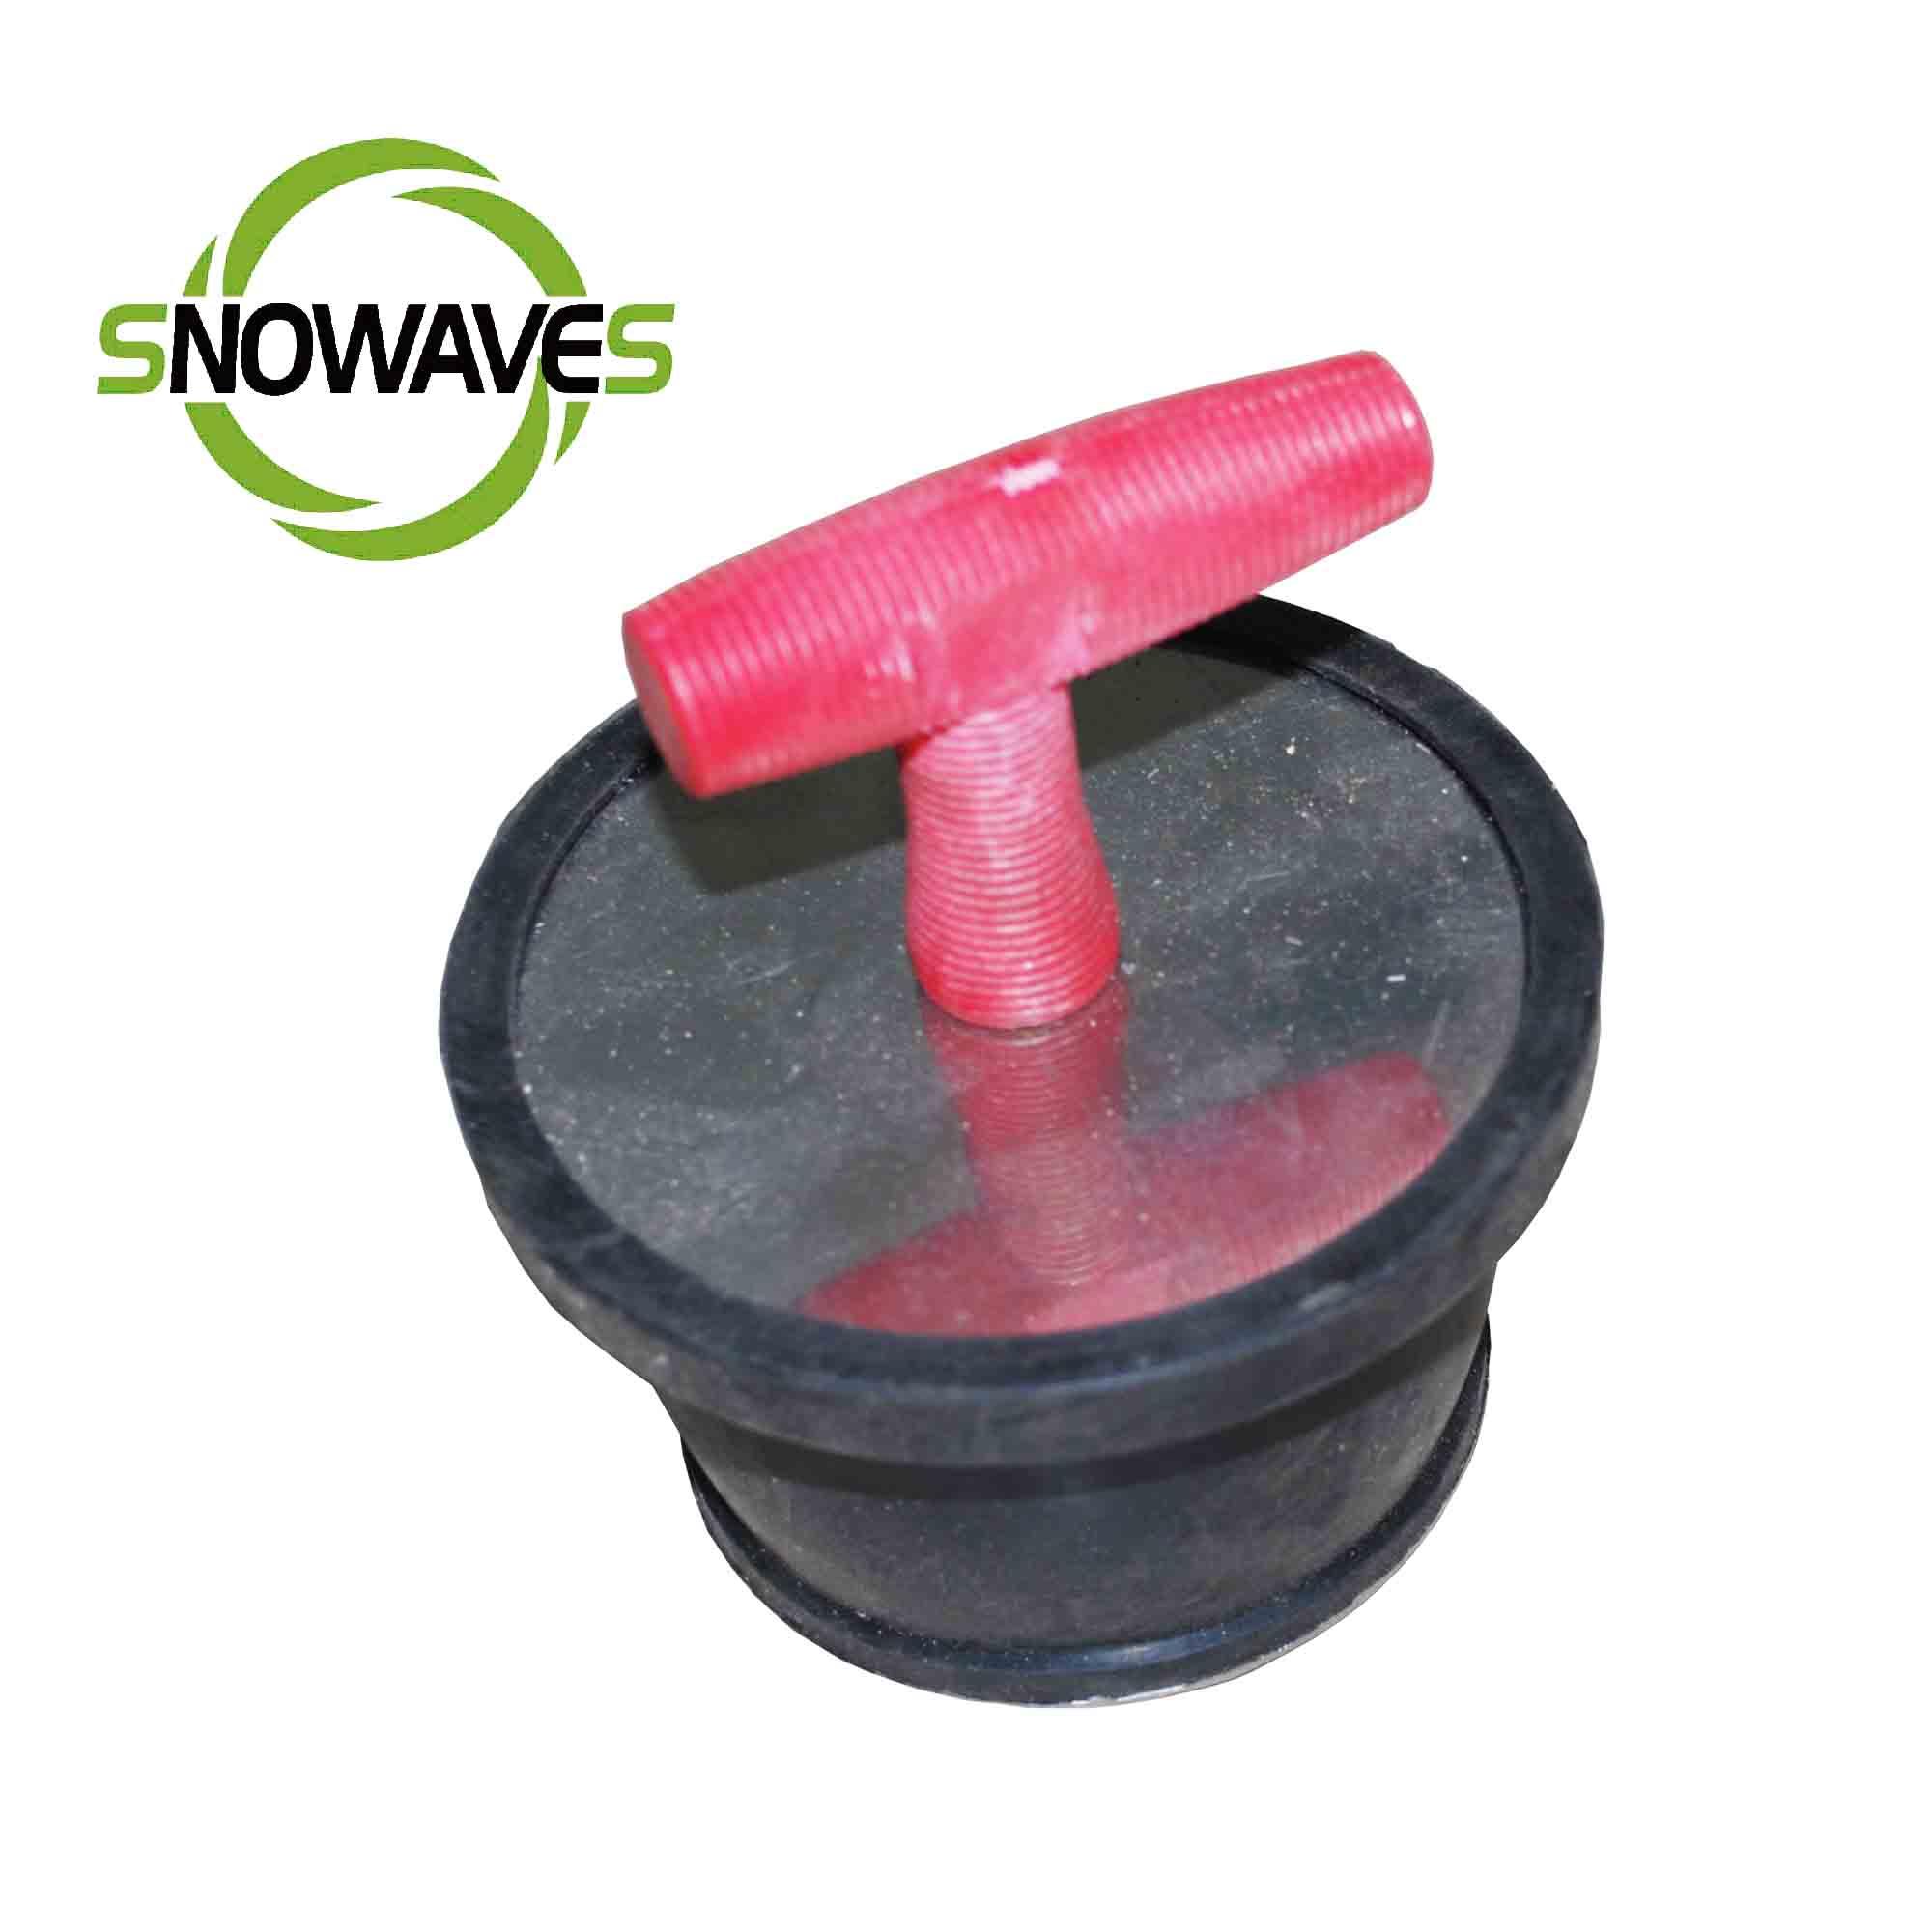 Marine Drain Plugs Impa Code 232481 - Buy Marine Drain Plugs,Oil ...